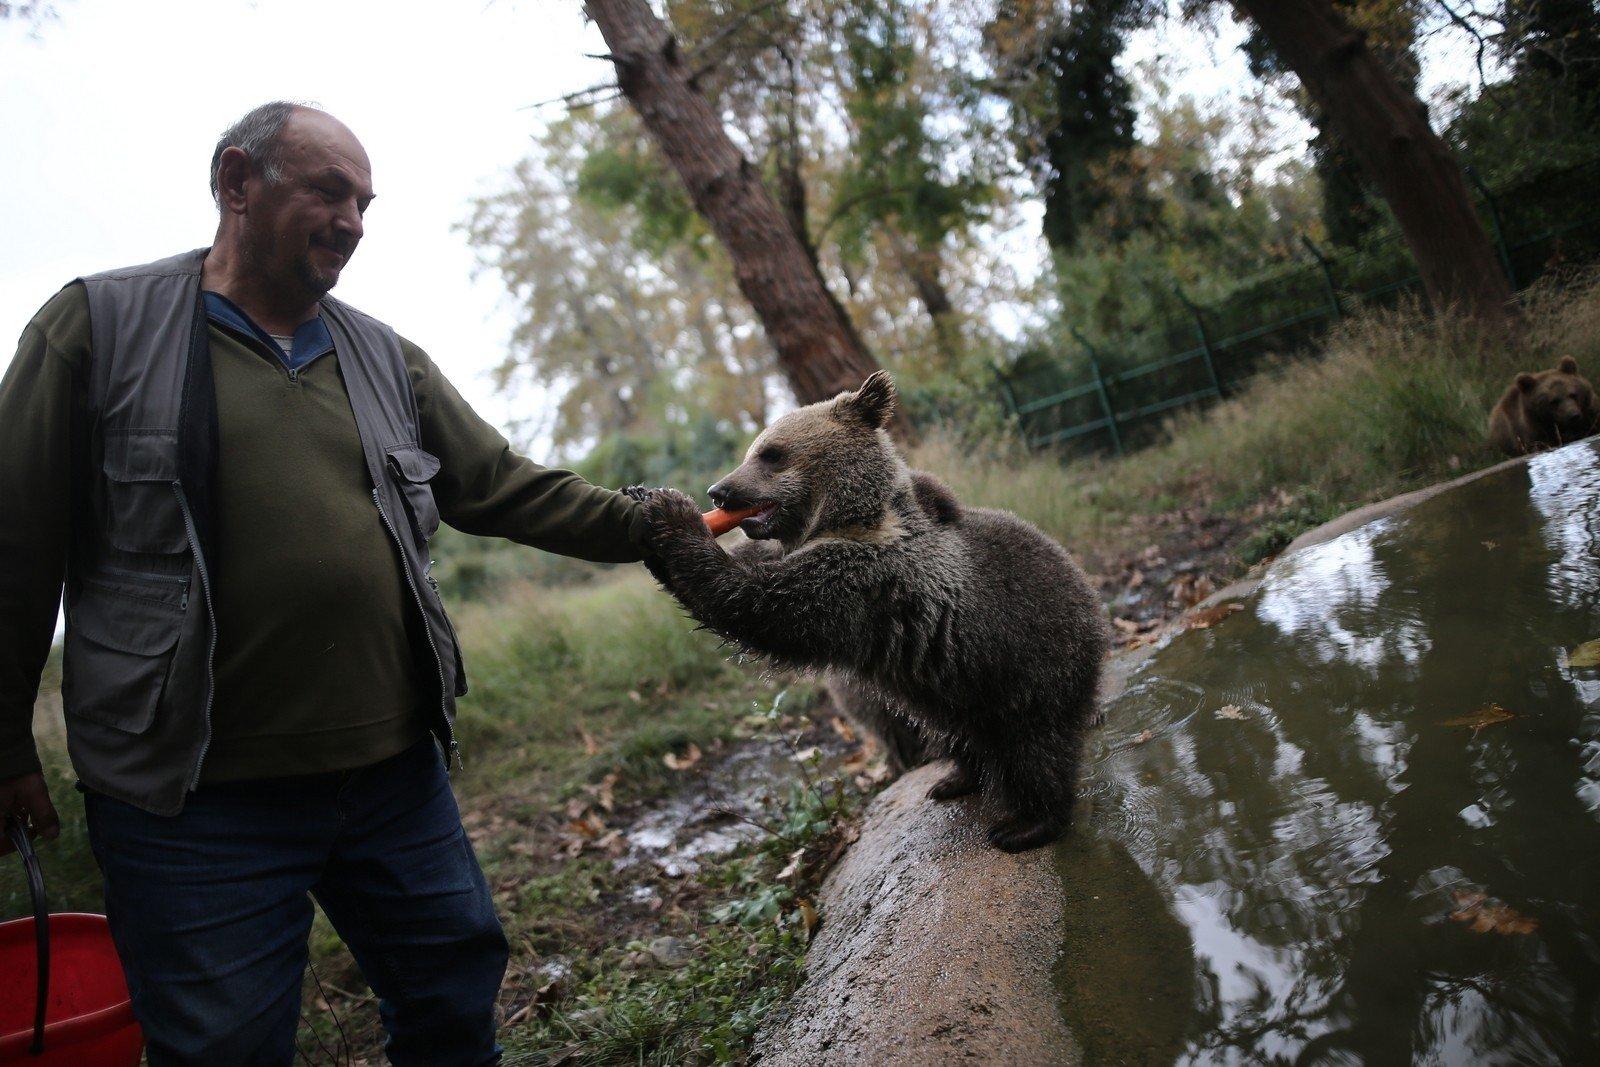 A cub holds the hand of his keeper as he feeds him a carrot, in Bursa, northwestern Turkey, Nov. 12, 2020. (IHA Photo)